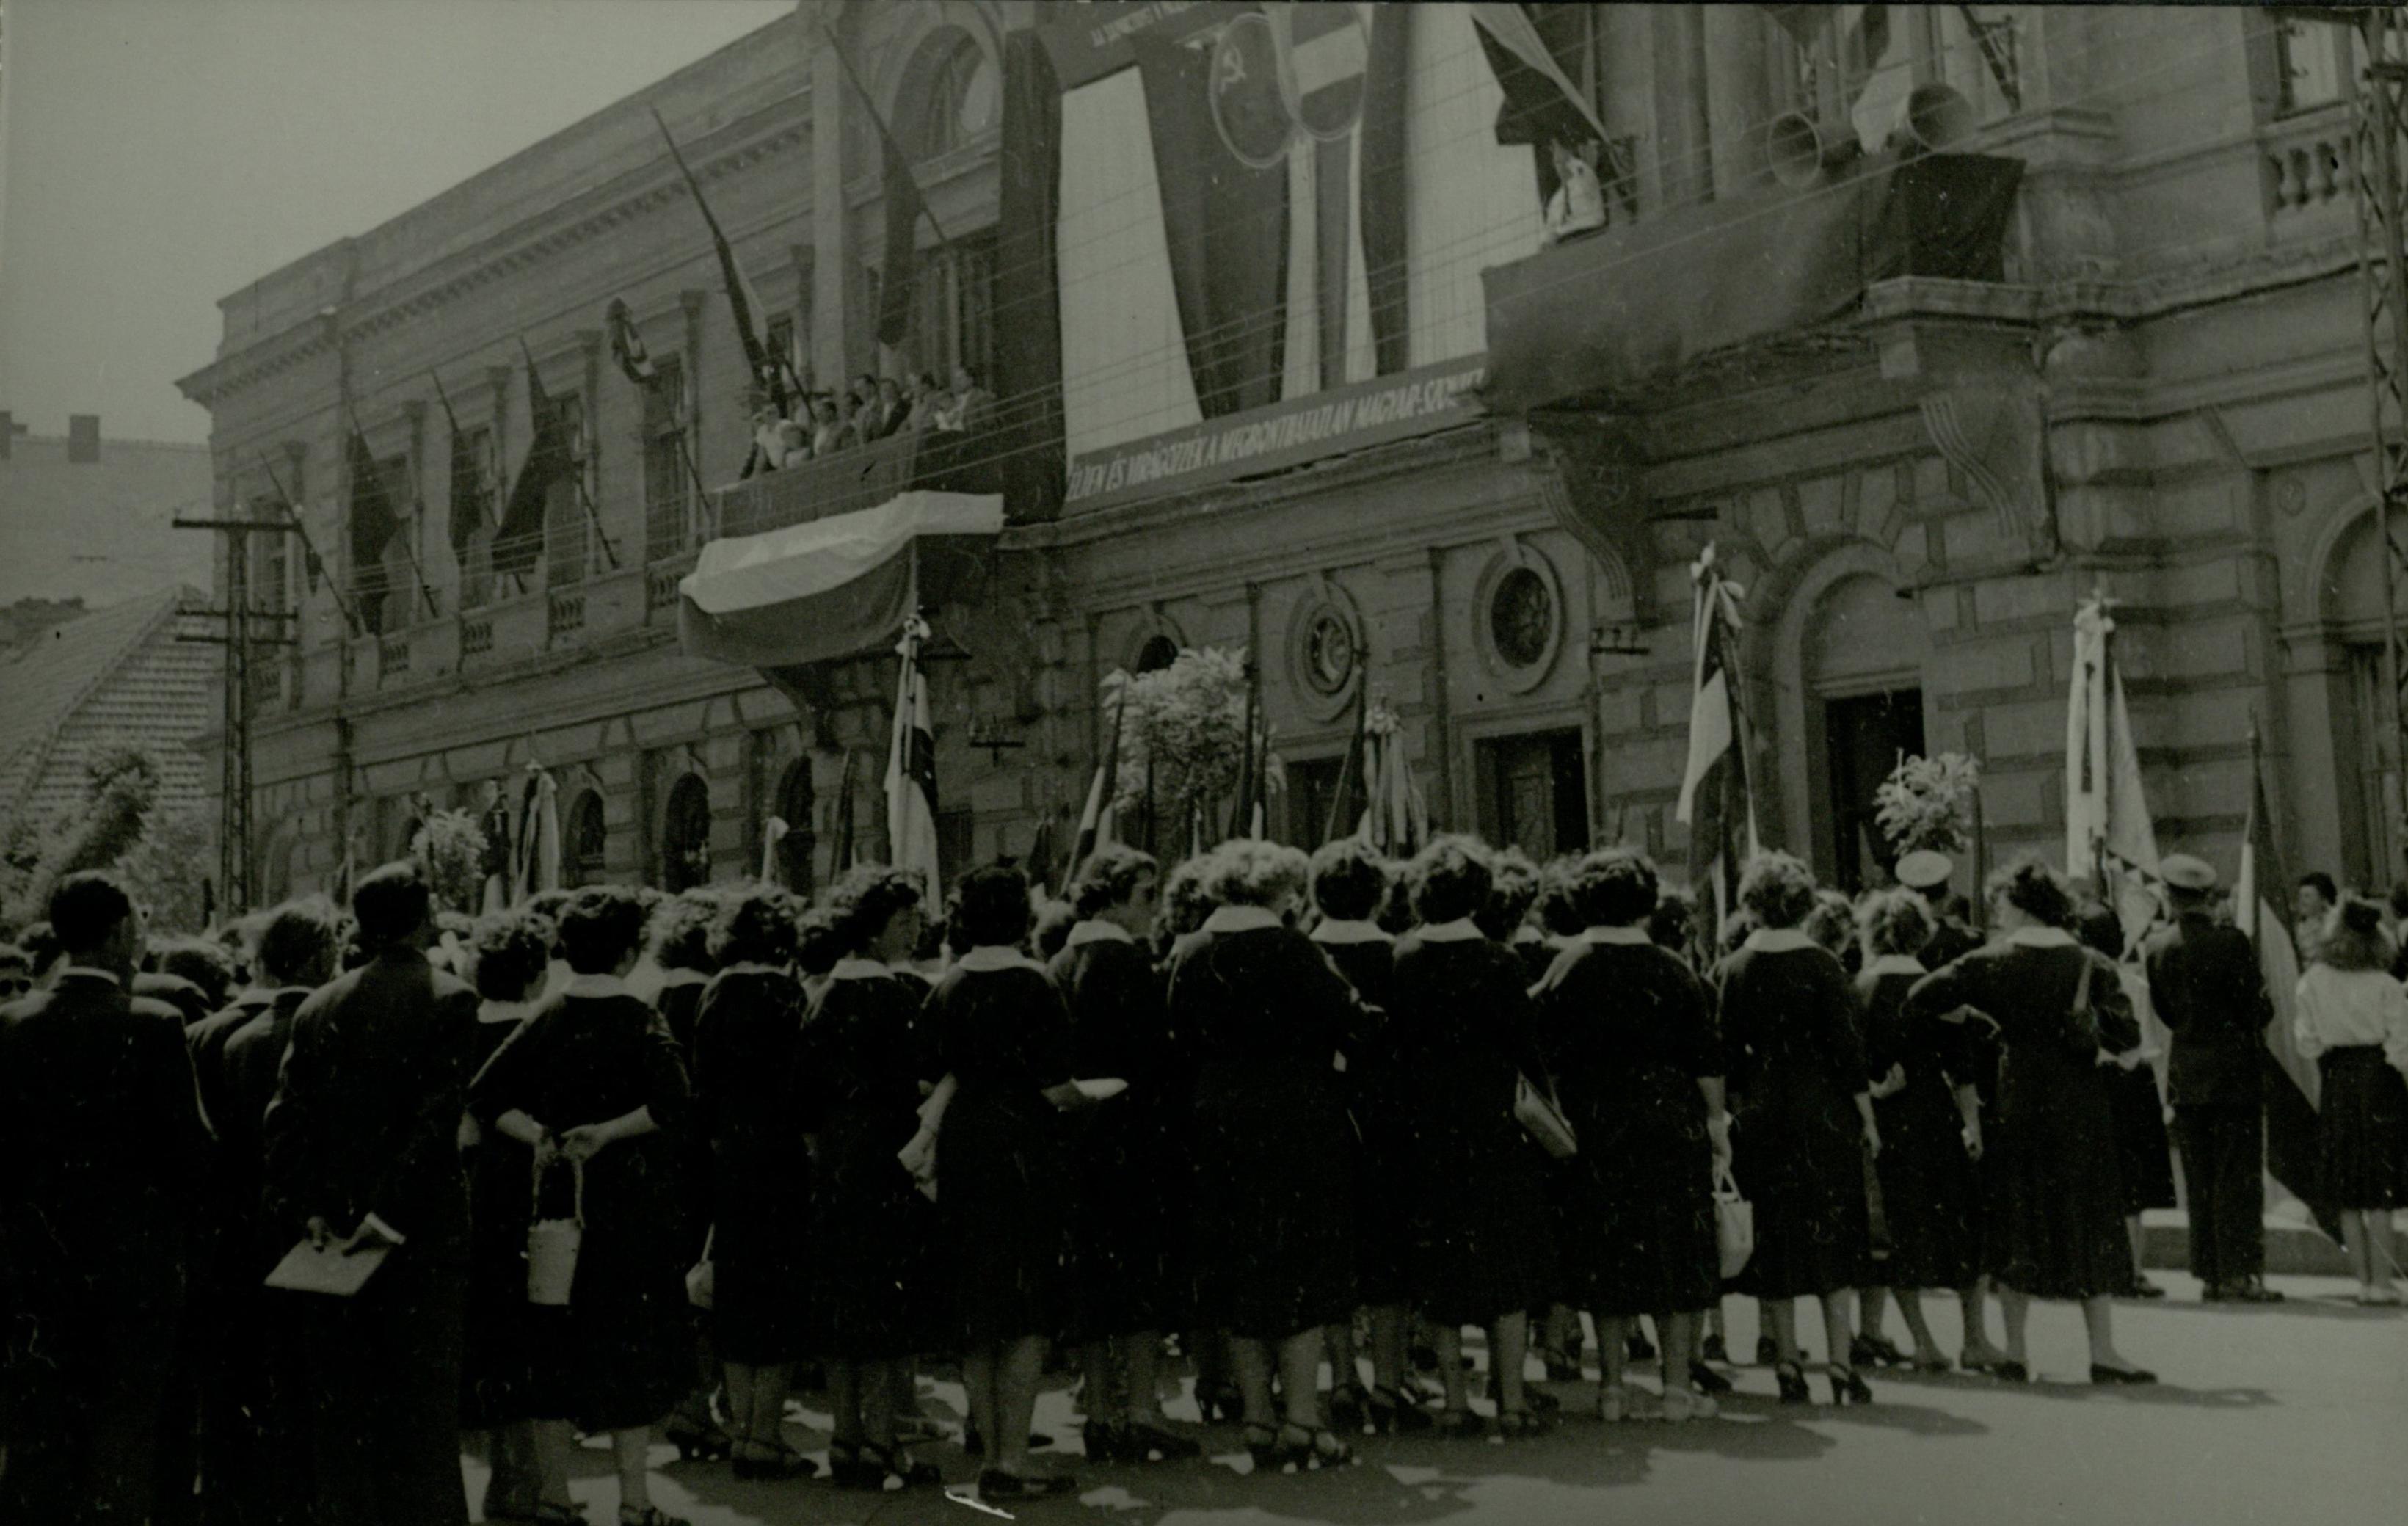 Szolnok Kossuth tér 1958.06.01.